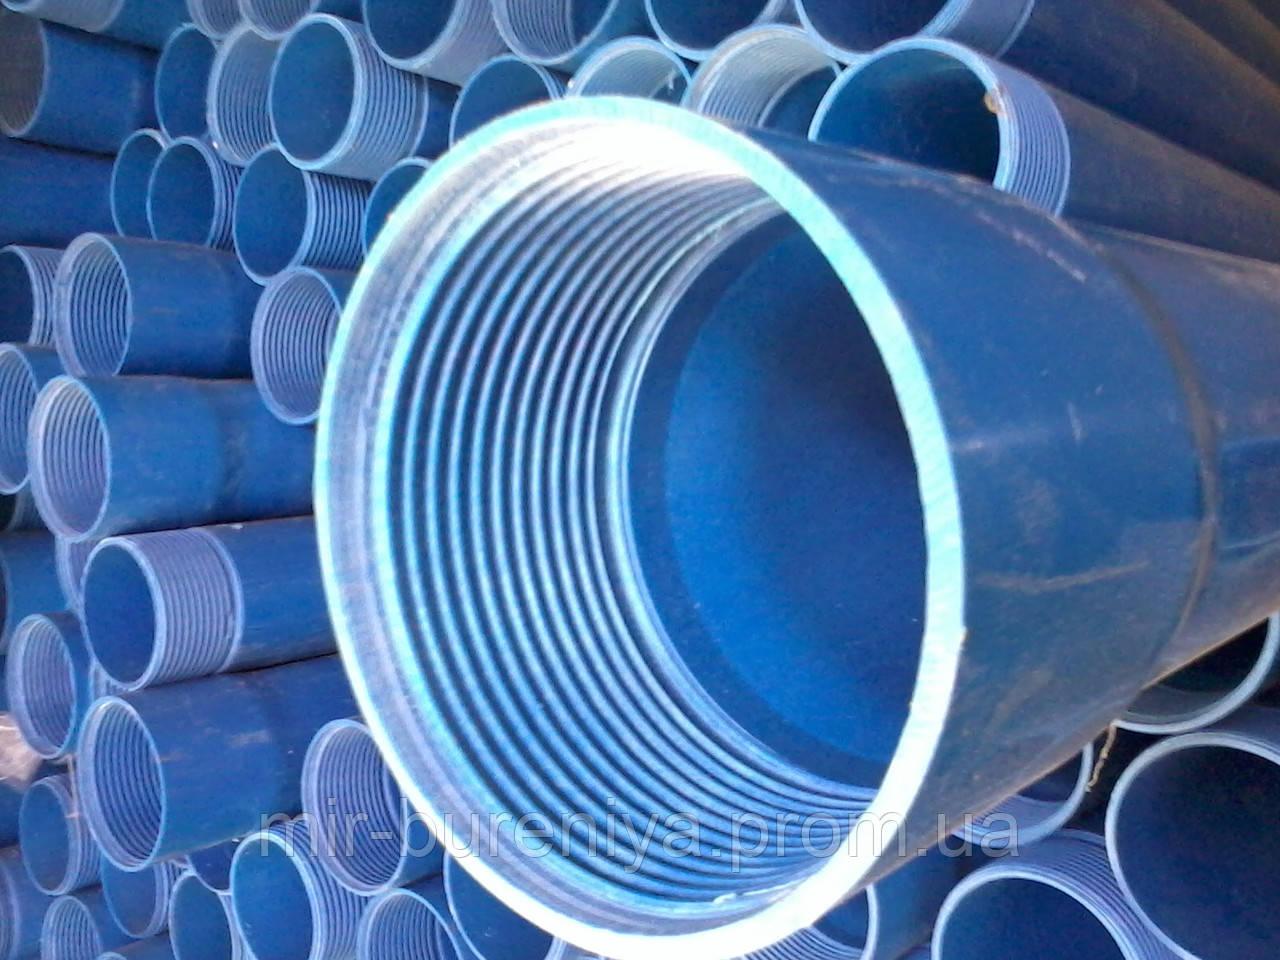 Обсадная пластиковая труба 125 мм 6 мм(2 м)